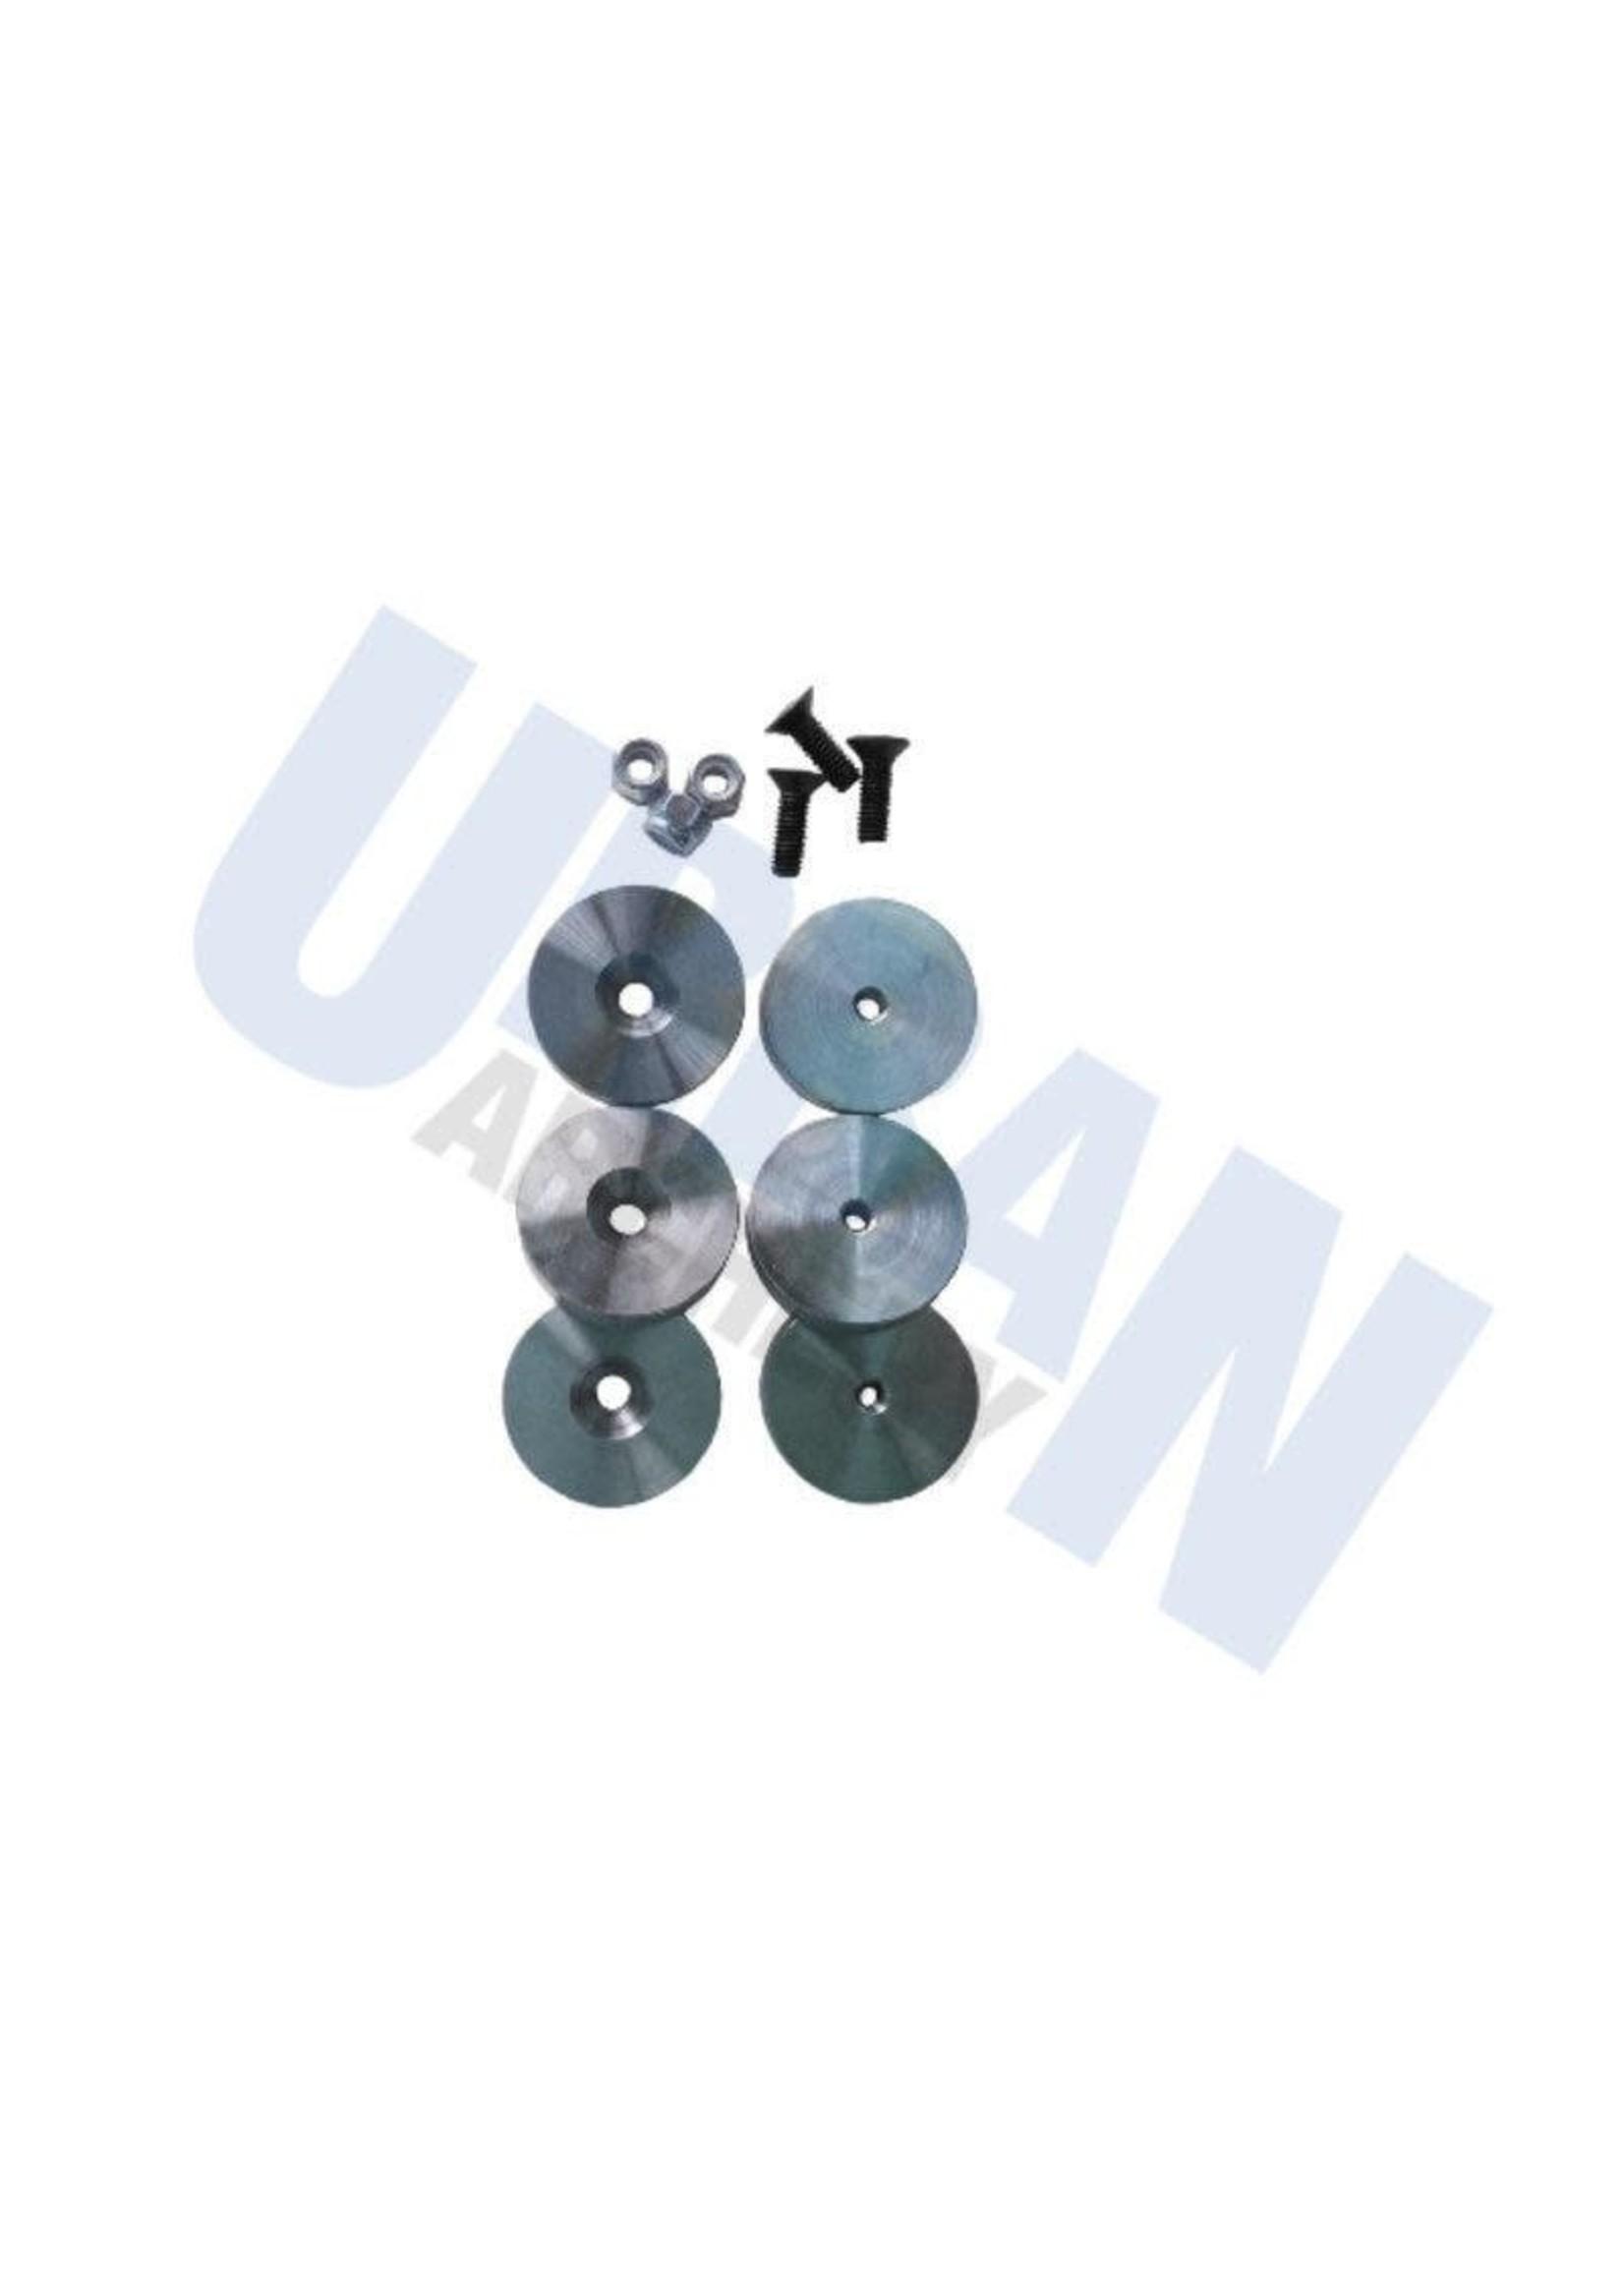 Gillo Gillo 6 Disk weights